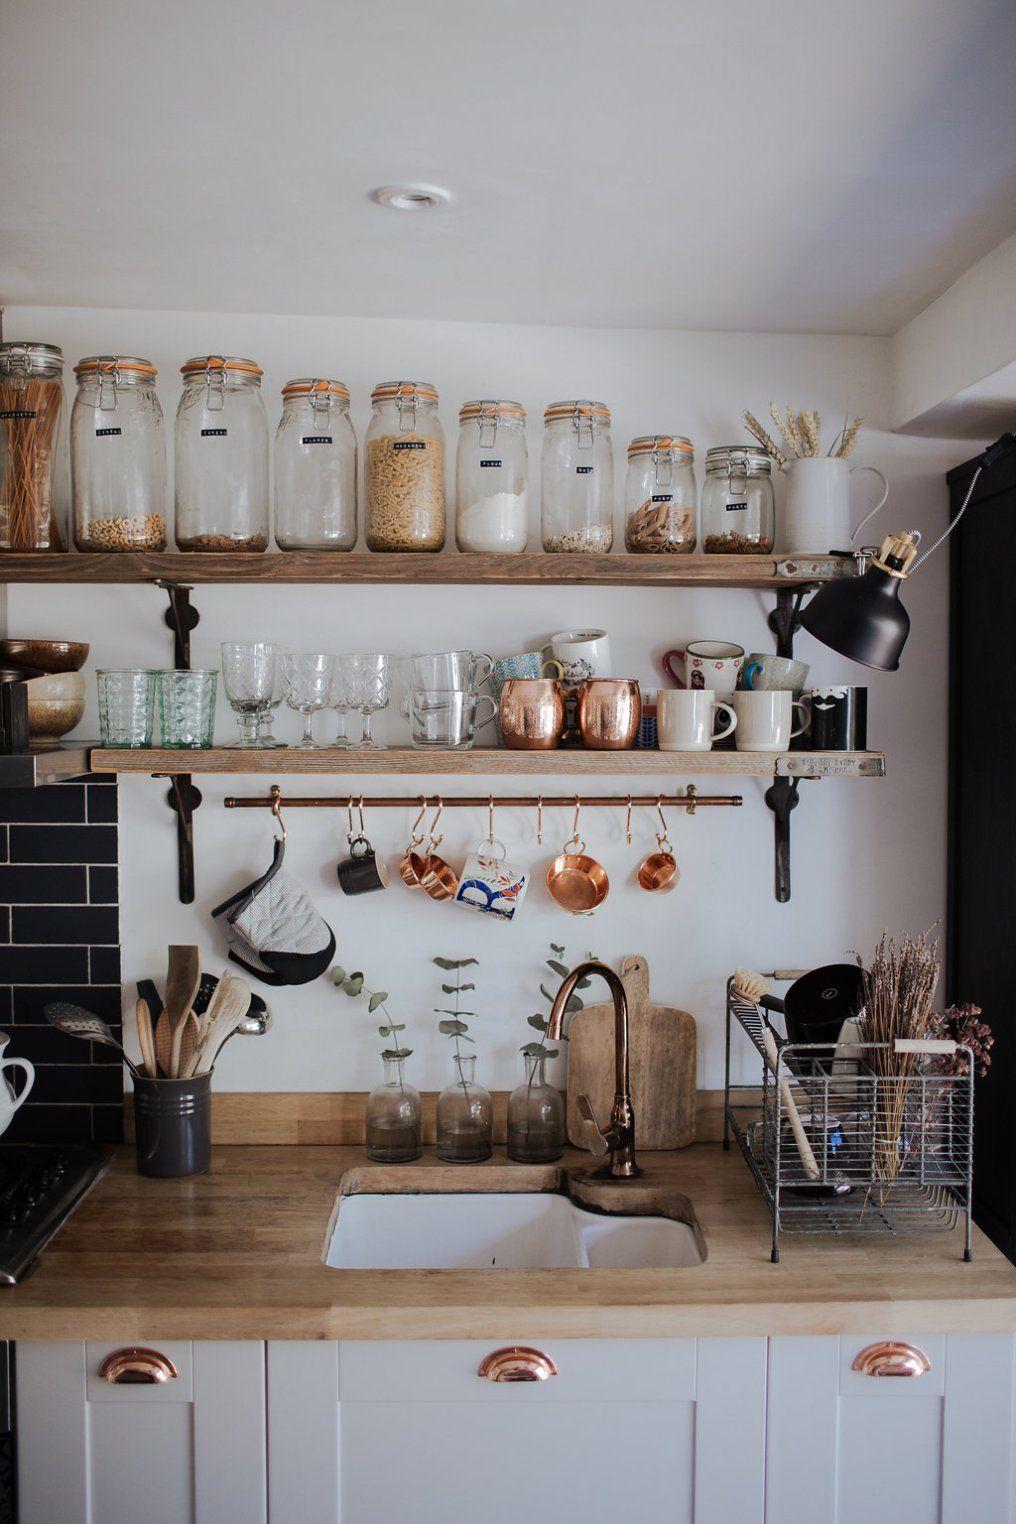 Interiors Envy Hygge For Home Hygge Home Hygge Decor